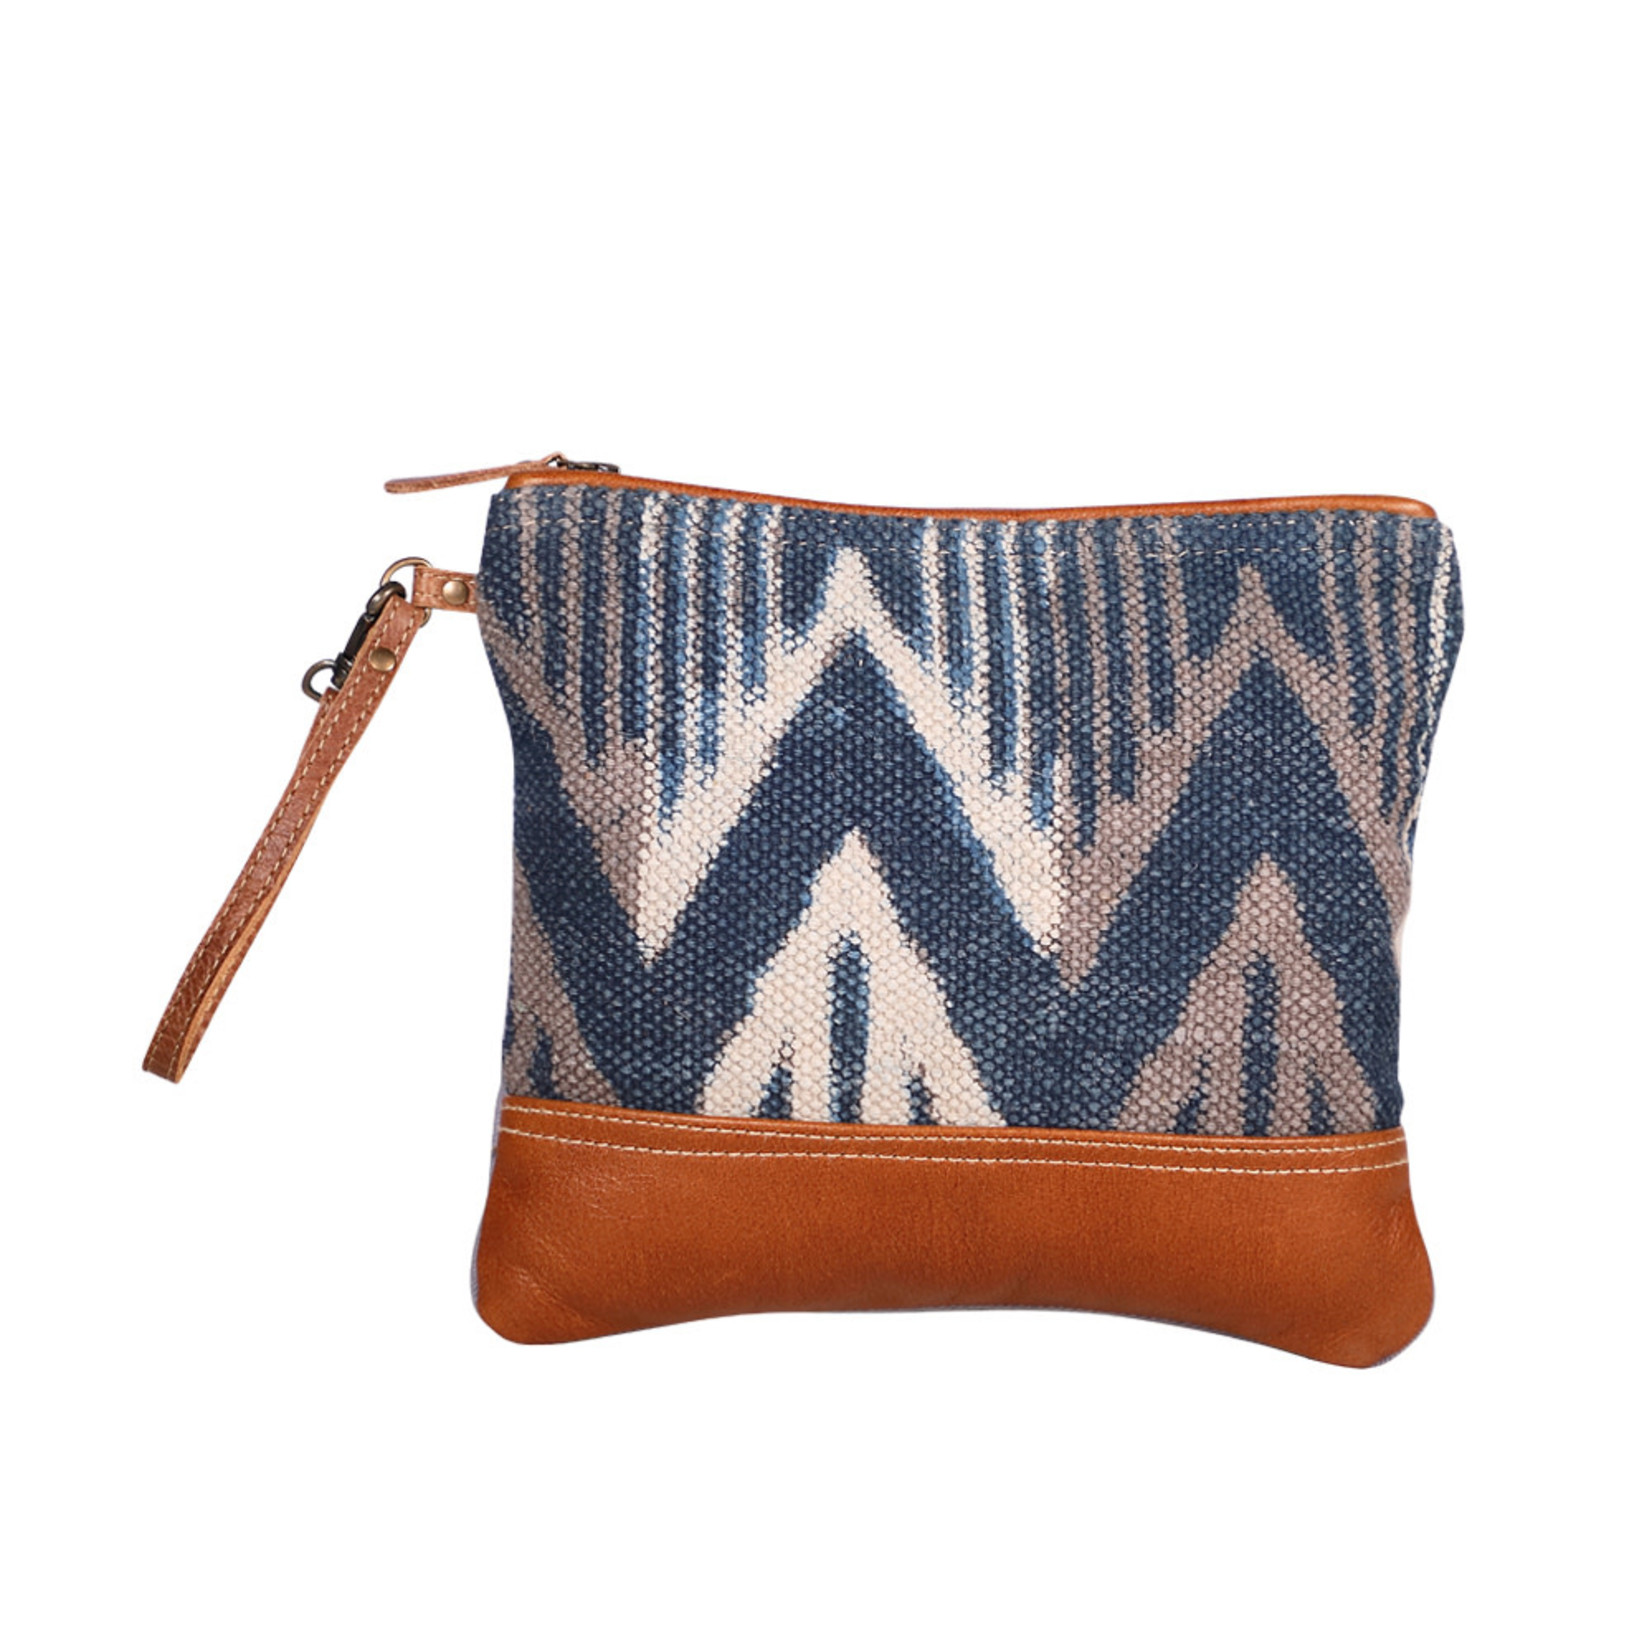 Myra Bags S-1941 Elegant Travel Pouch / Wristlet